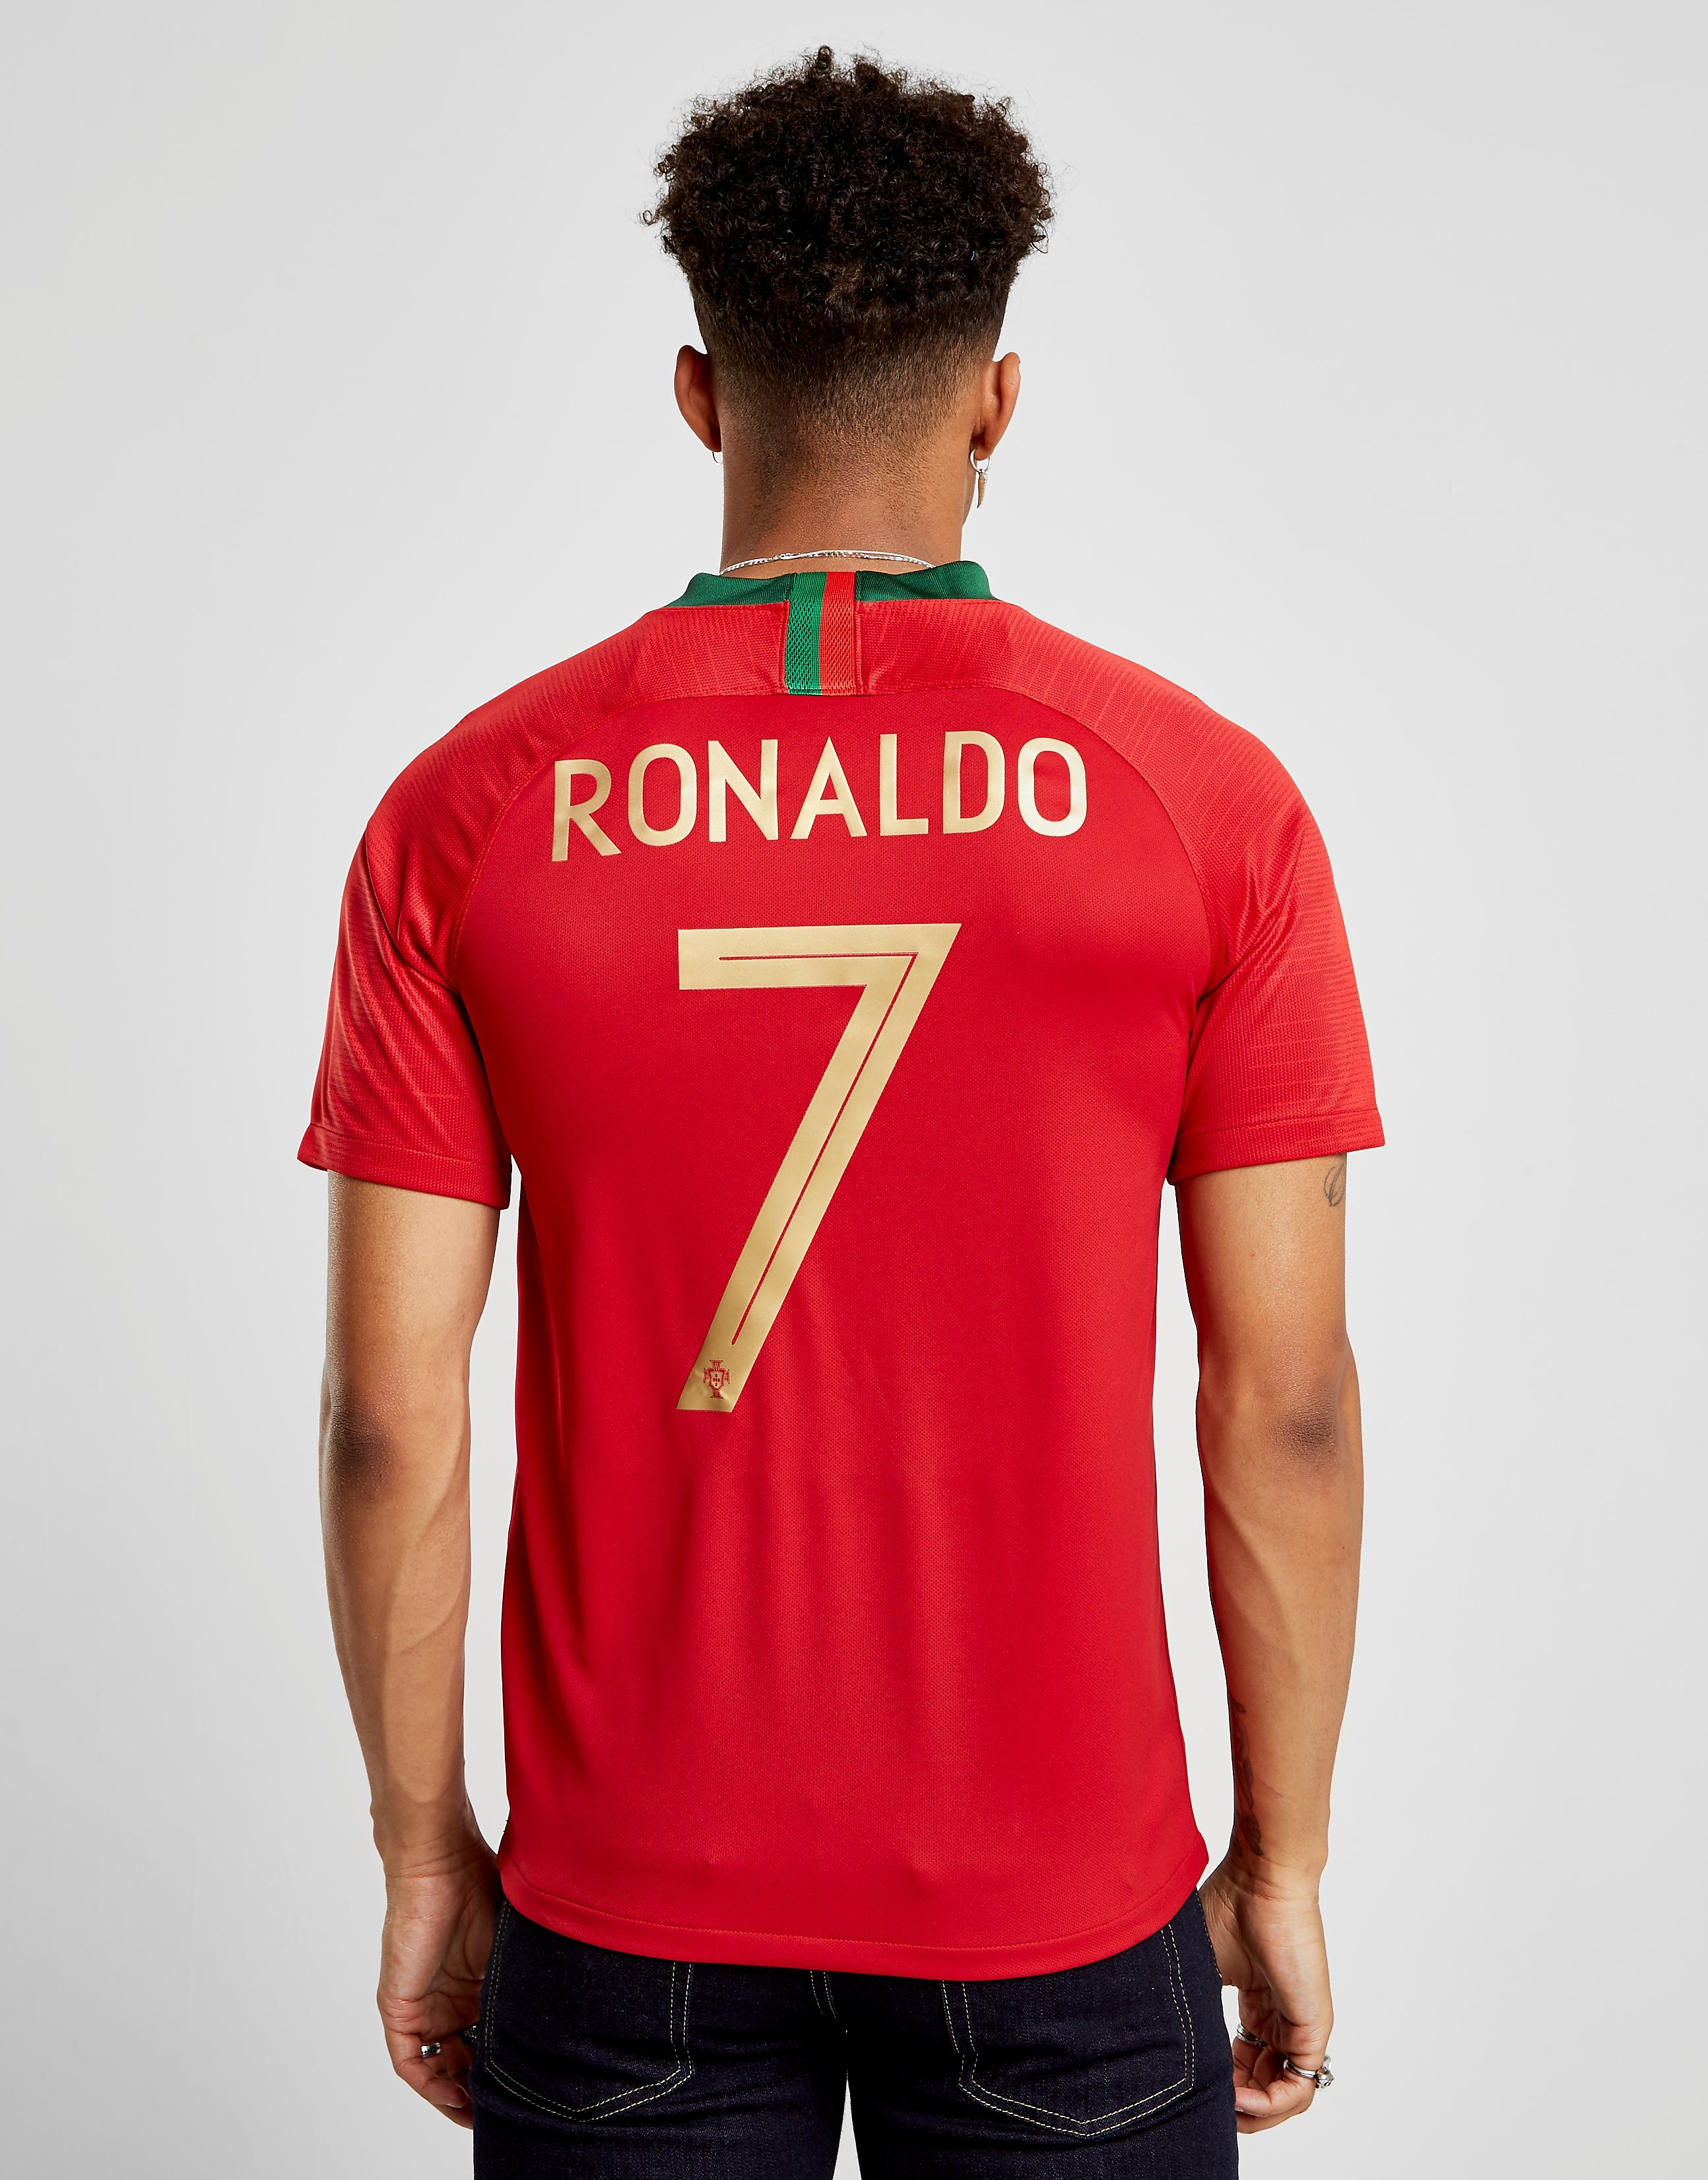 Nike Portugal 2018/19 Ronaldo #7 Home Shirt